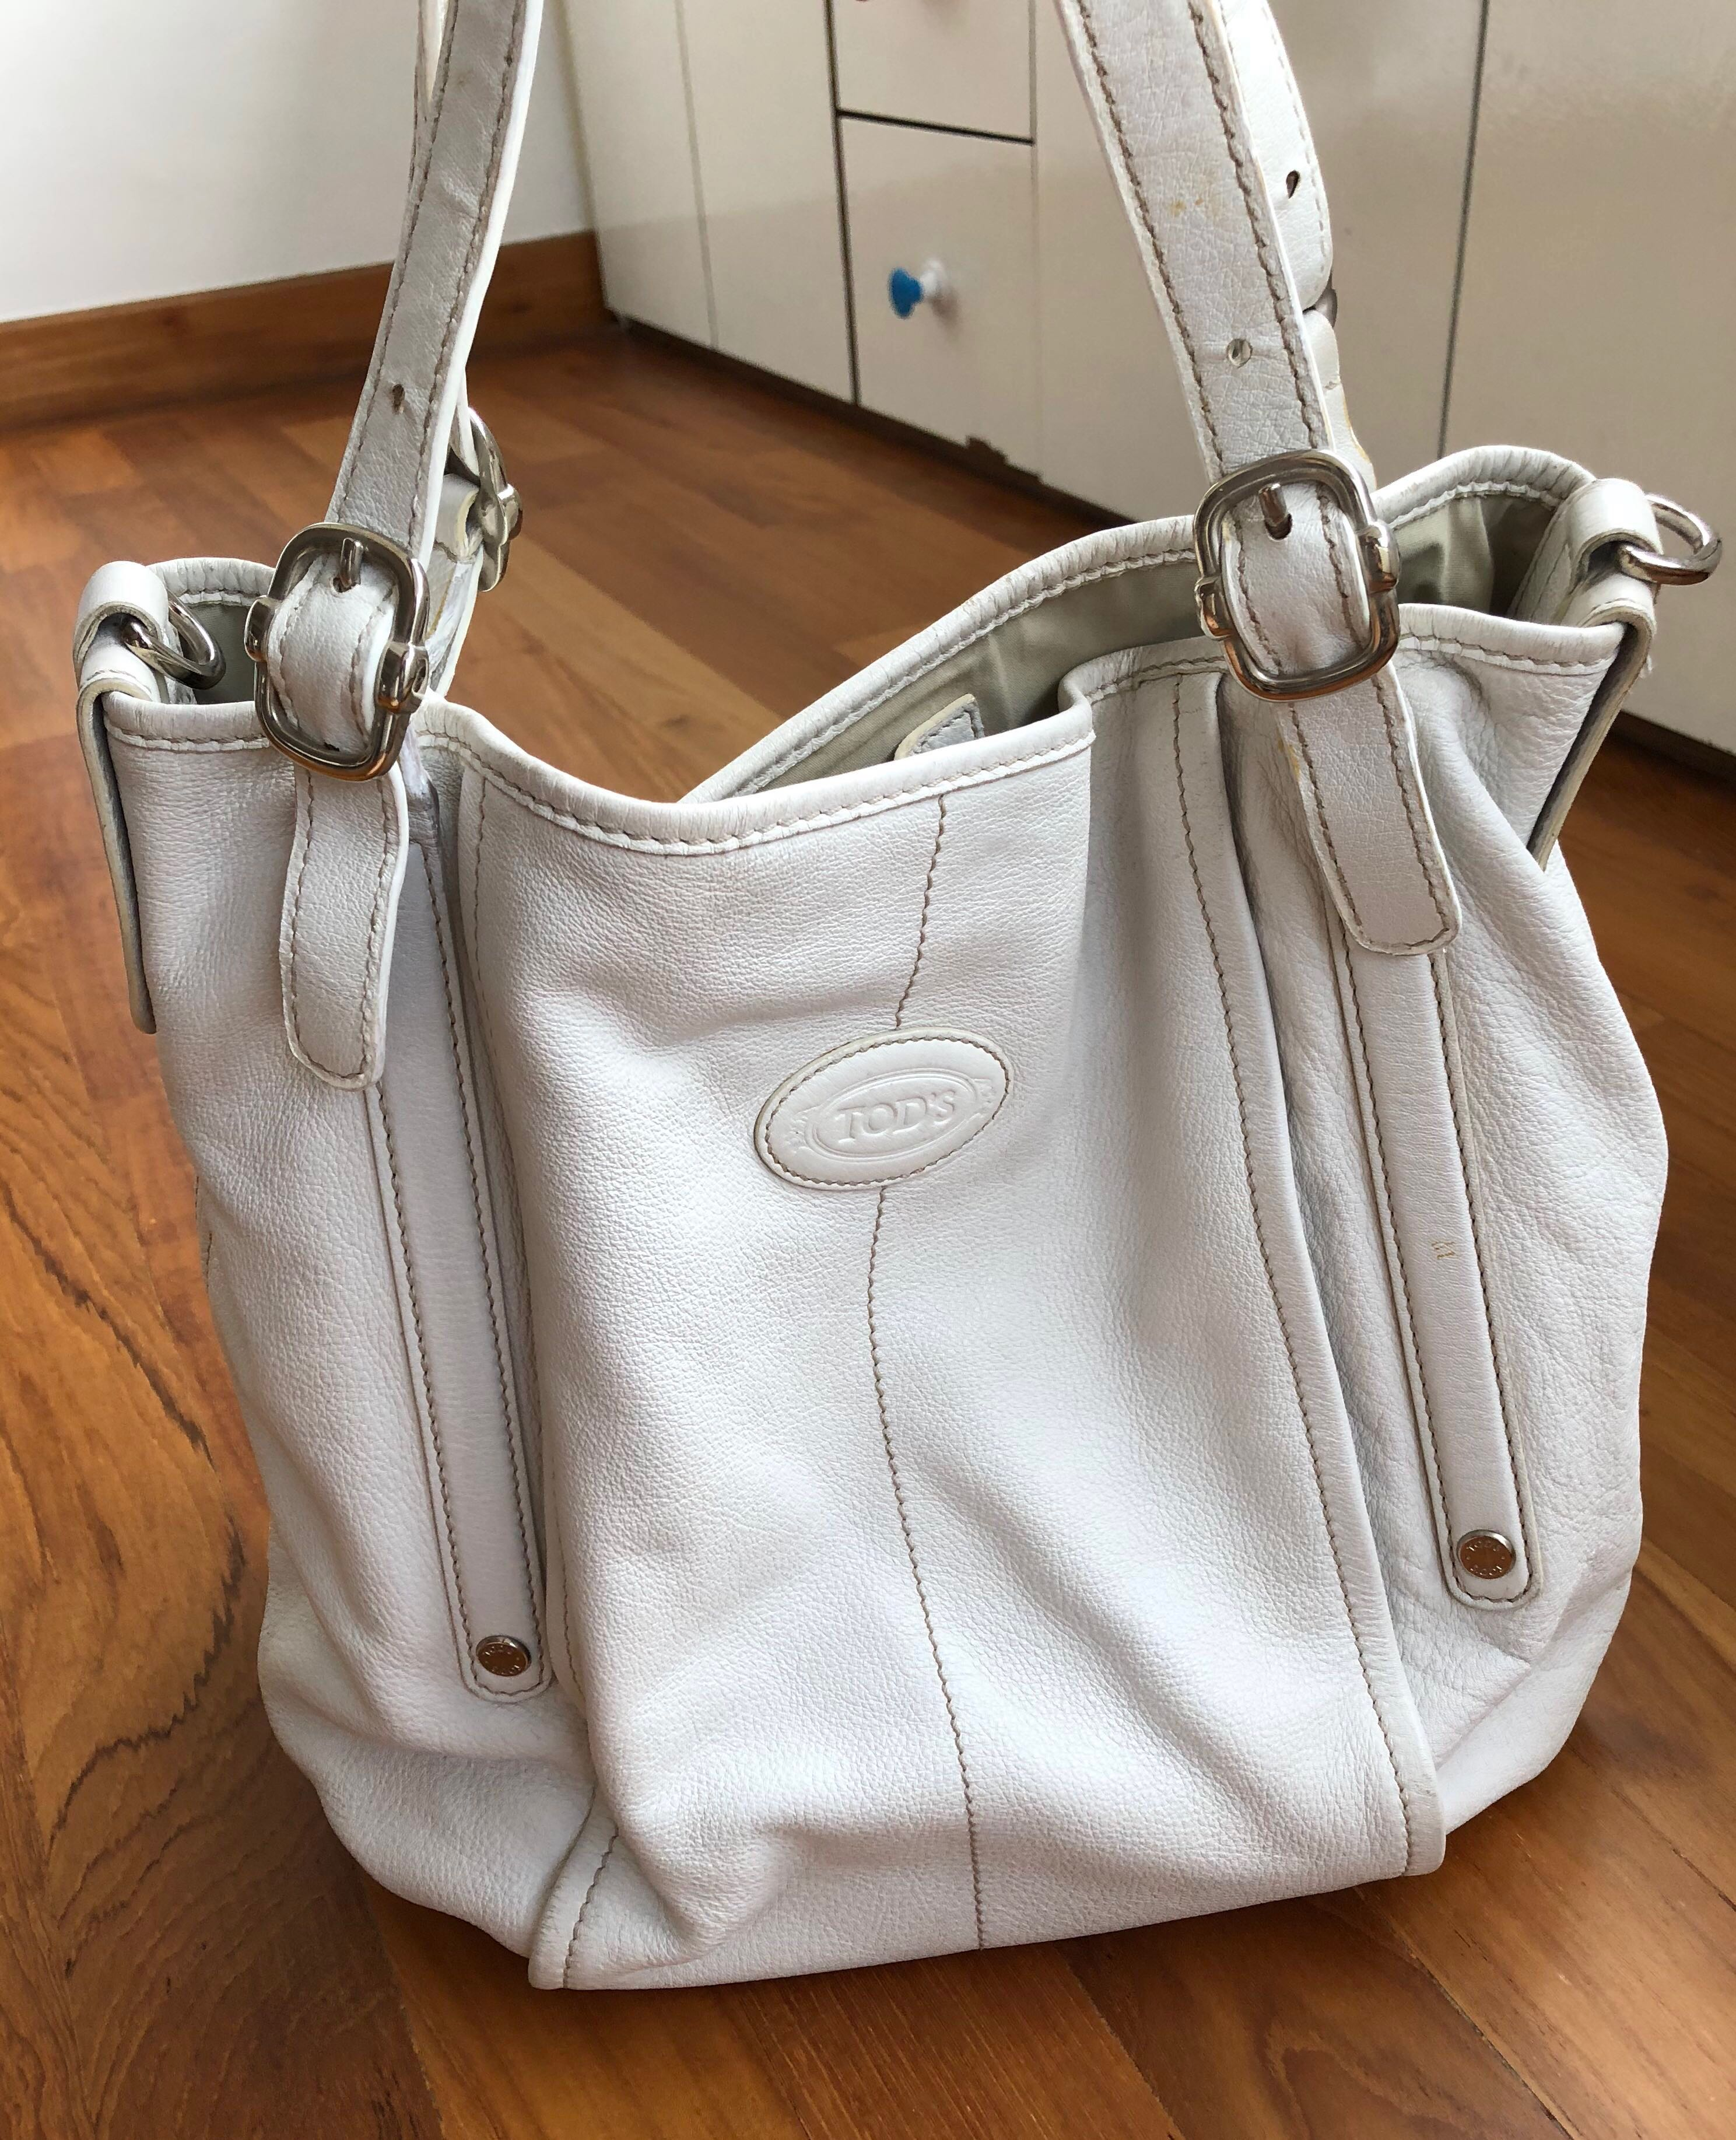 ea2ae13b25 Tod s G-bag Shopper Tote Bag. Authentic. Cream White leather. Large ...